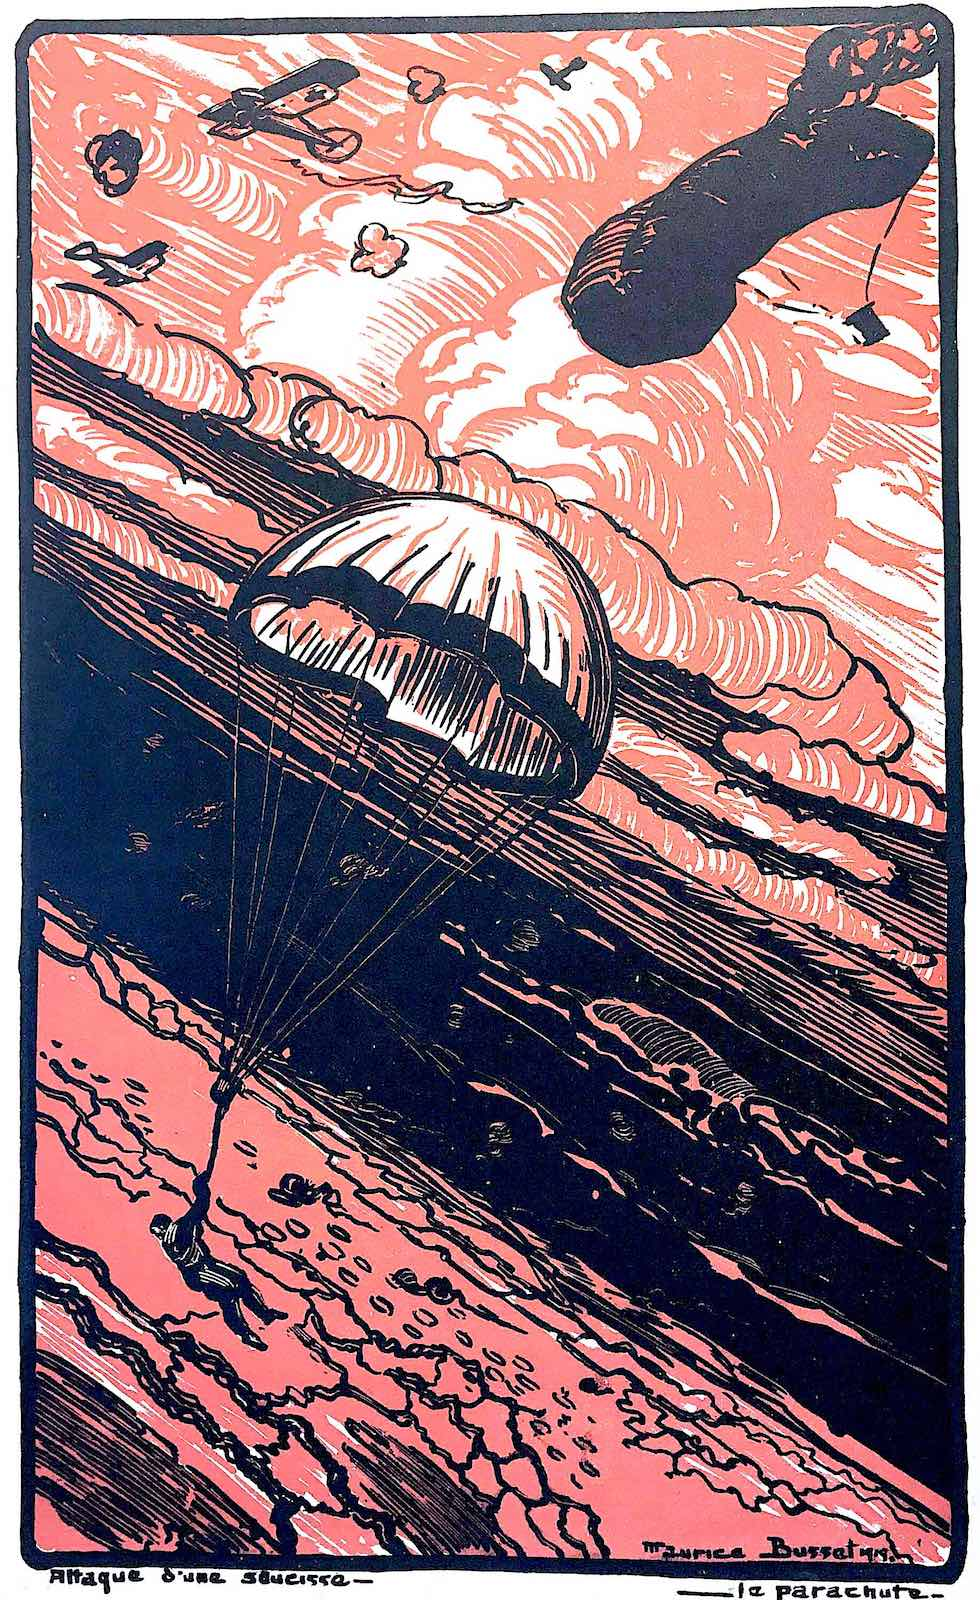 a Maurice Busset illustration of men parachuting in war